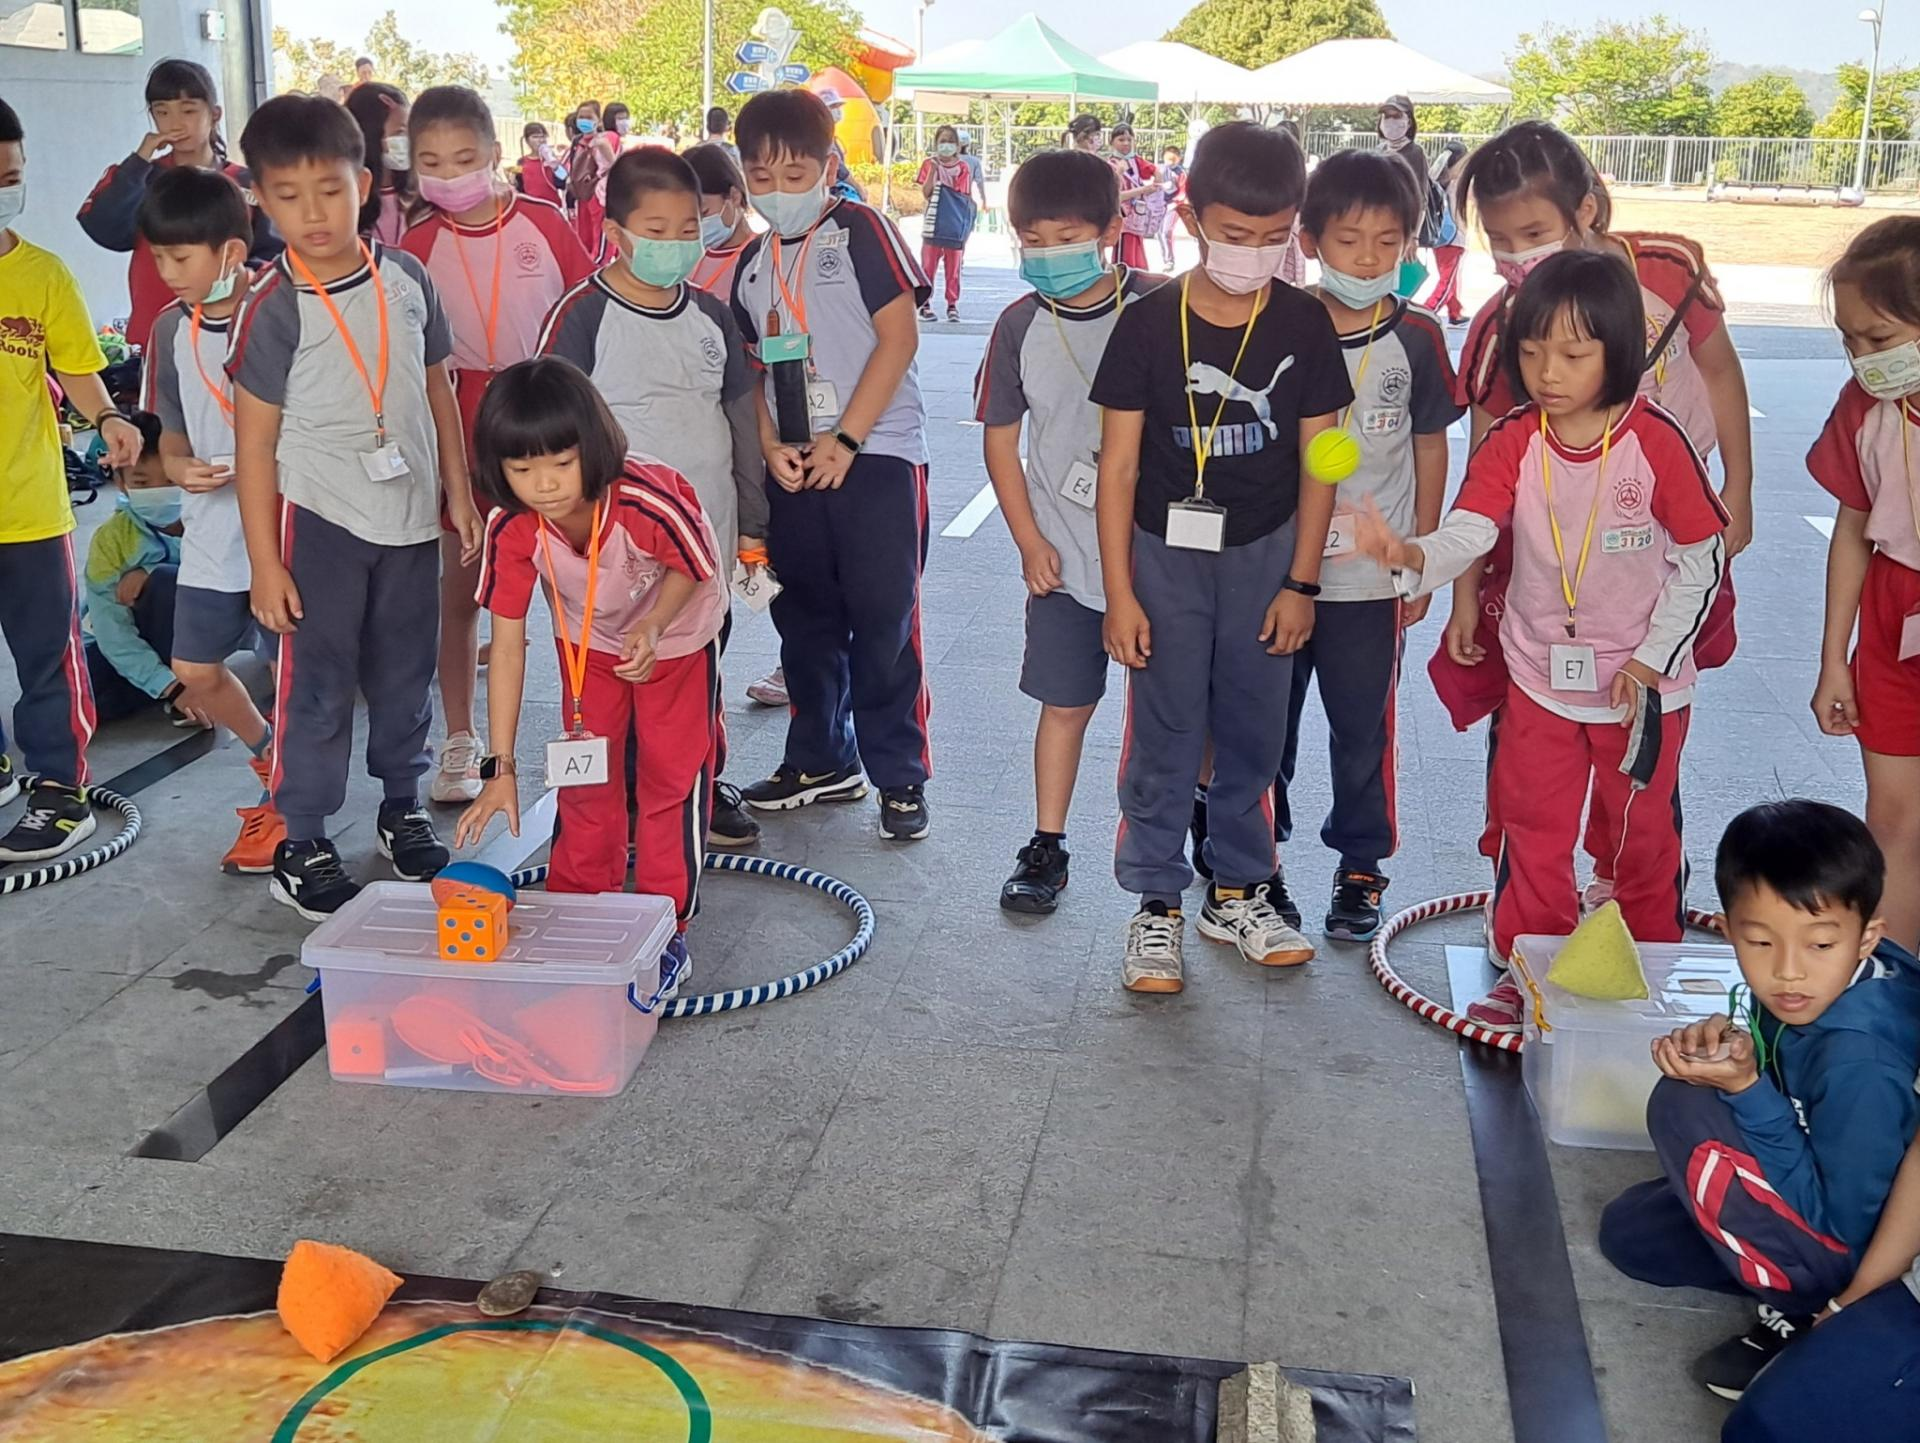 https://www.tles.cyc.edu.tw/uploads/tadgallery/2021_03_19/2857_三甲校外教學_210317_4.jpg